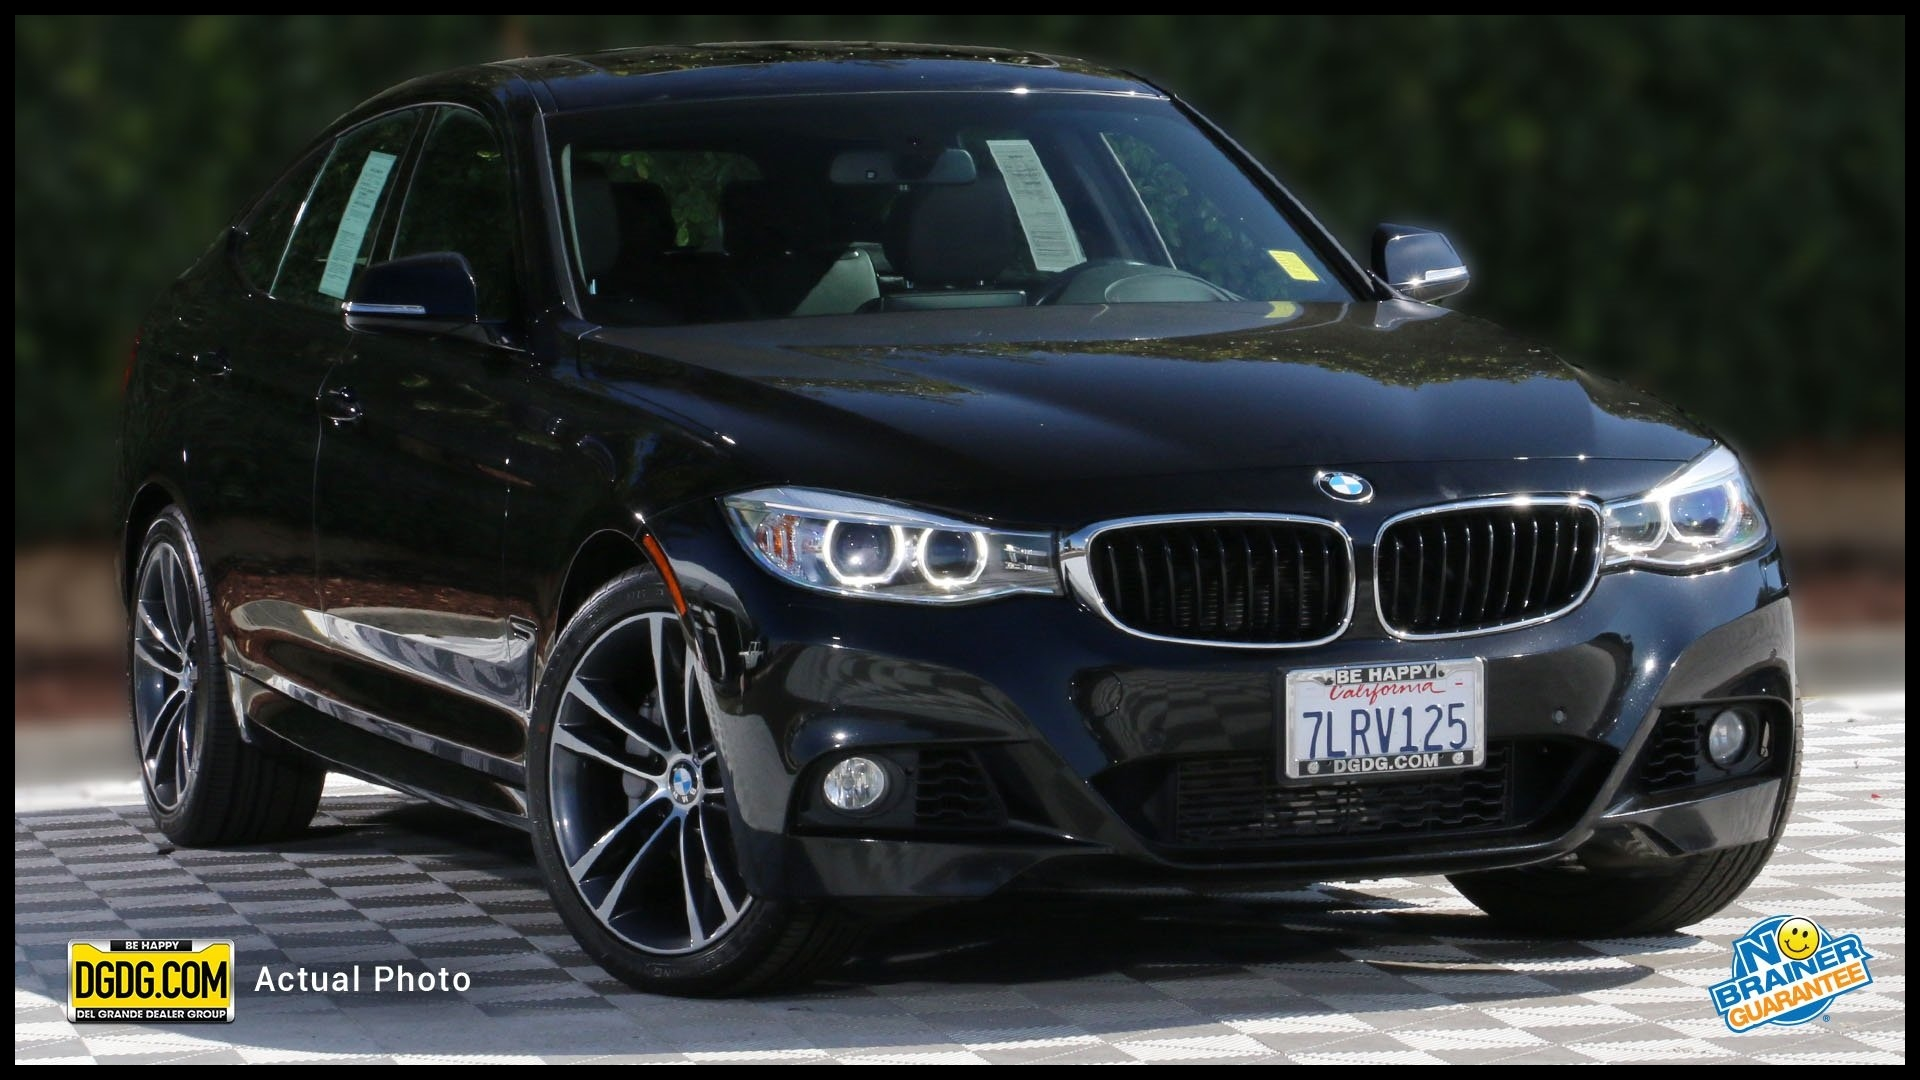 Pre Owned 2015 BMW 3 Series 335i xDrive Gran Turismo